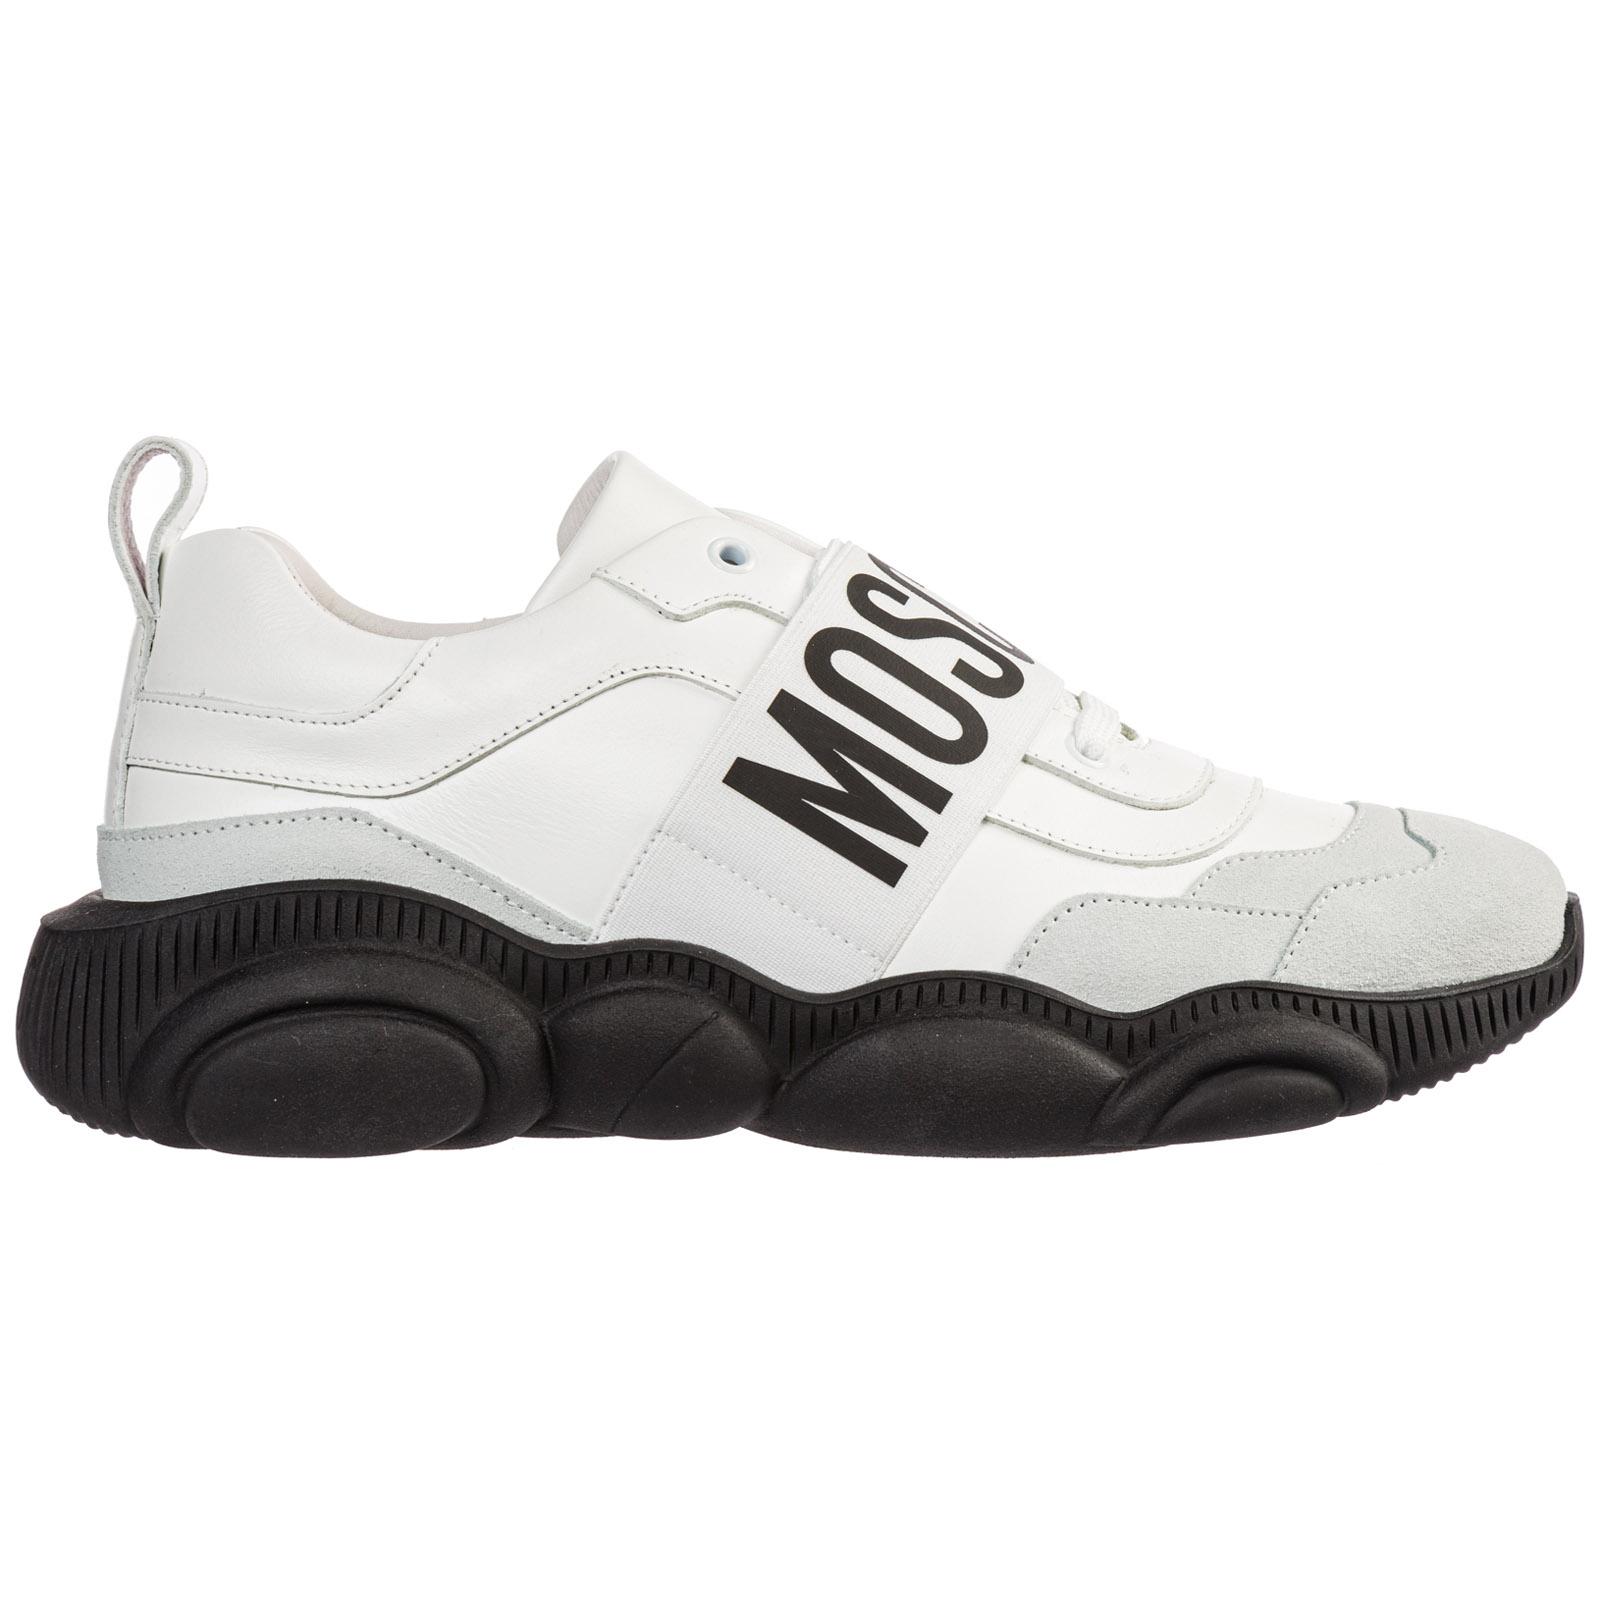 best sneakers 39489 331d5 Scarpe sneakers uomo in pelle teddy run